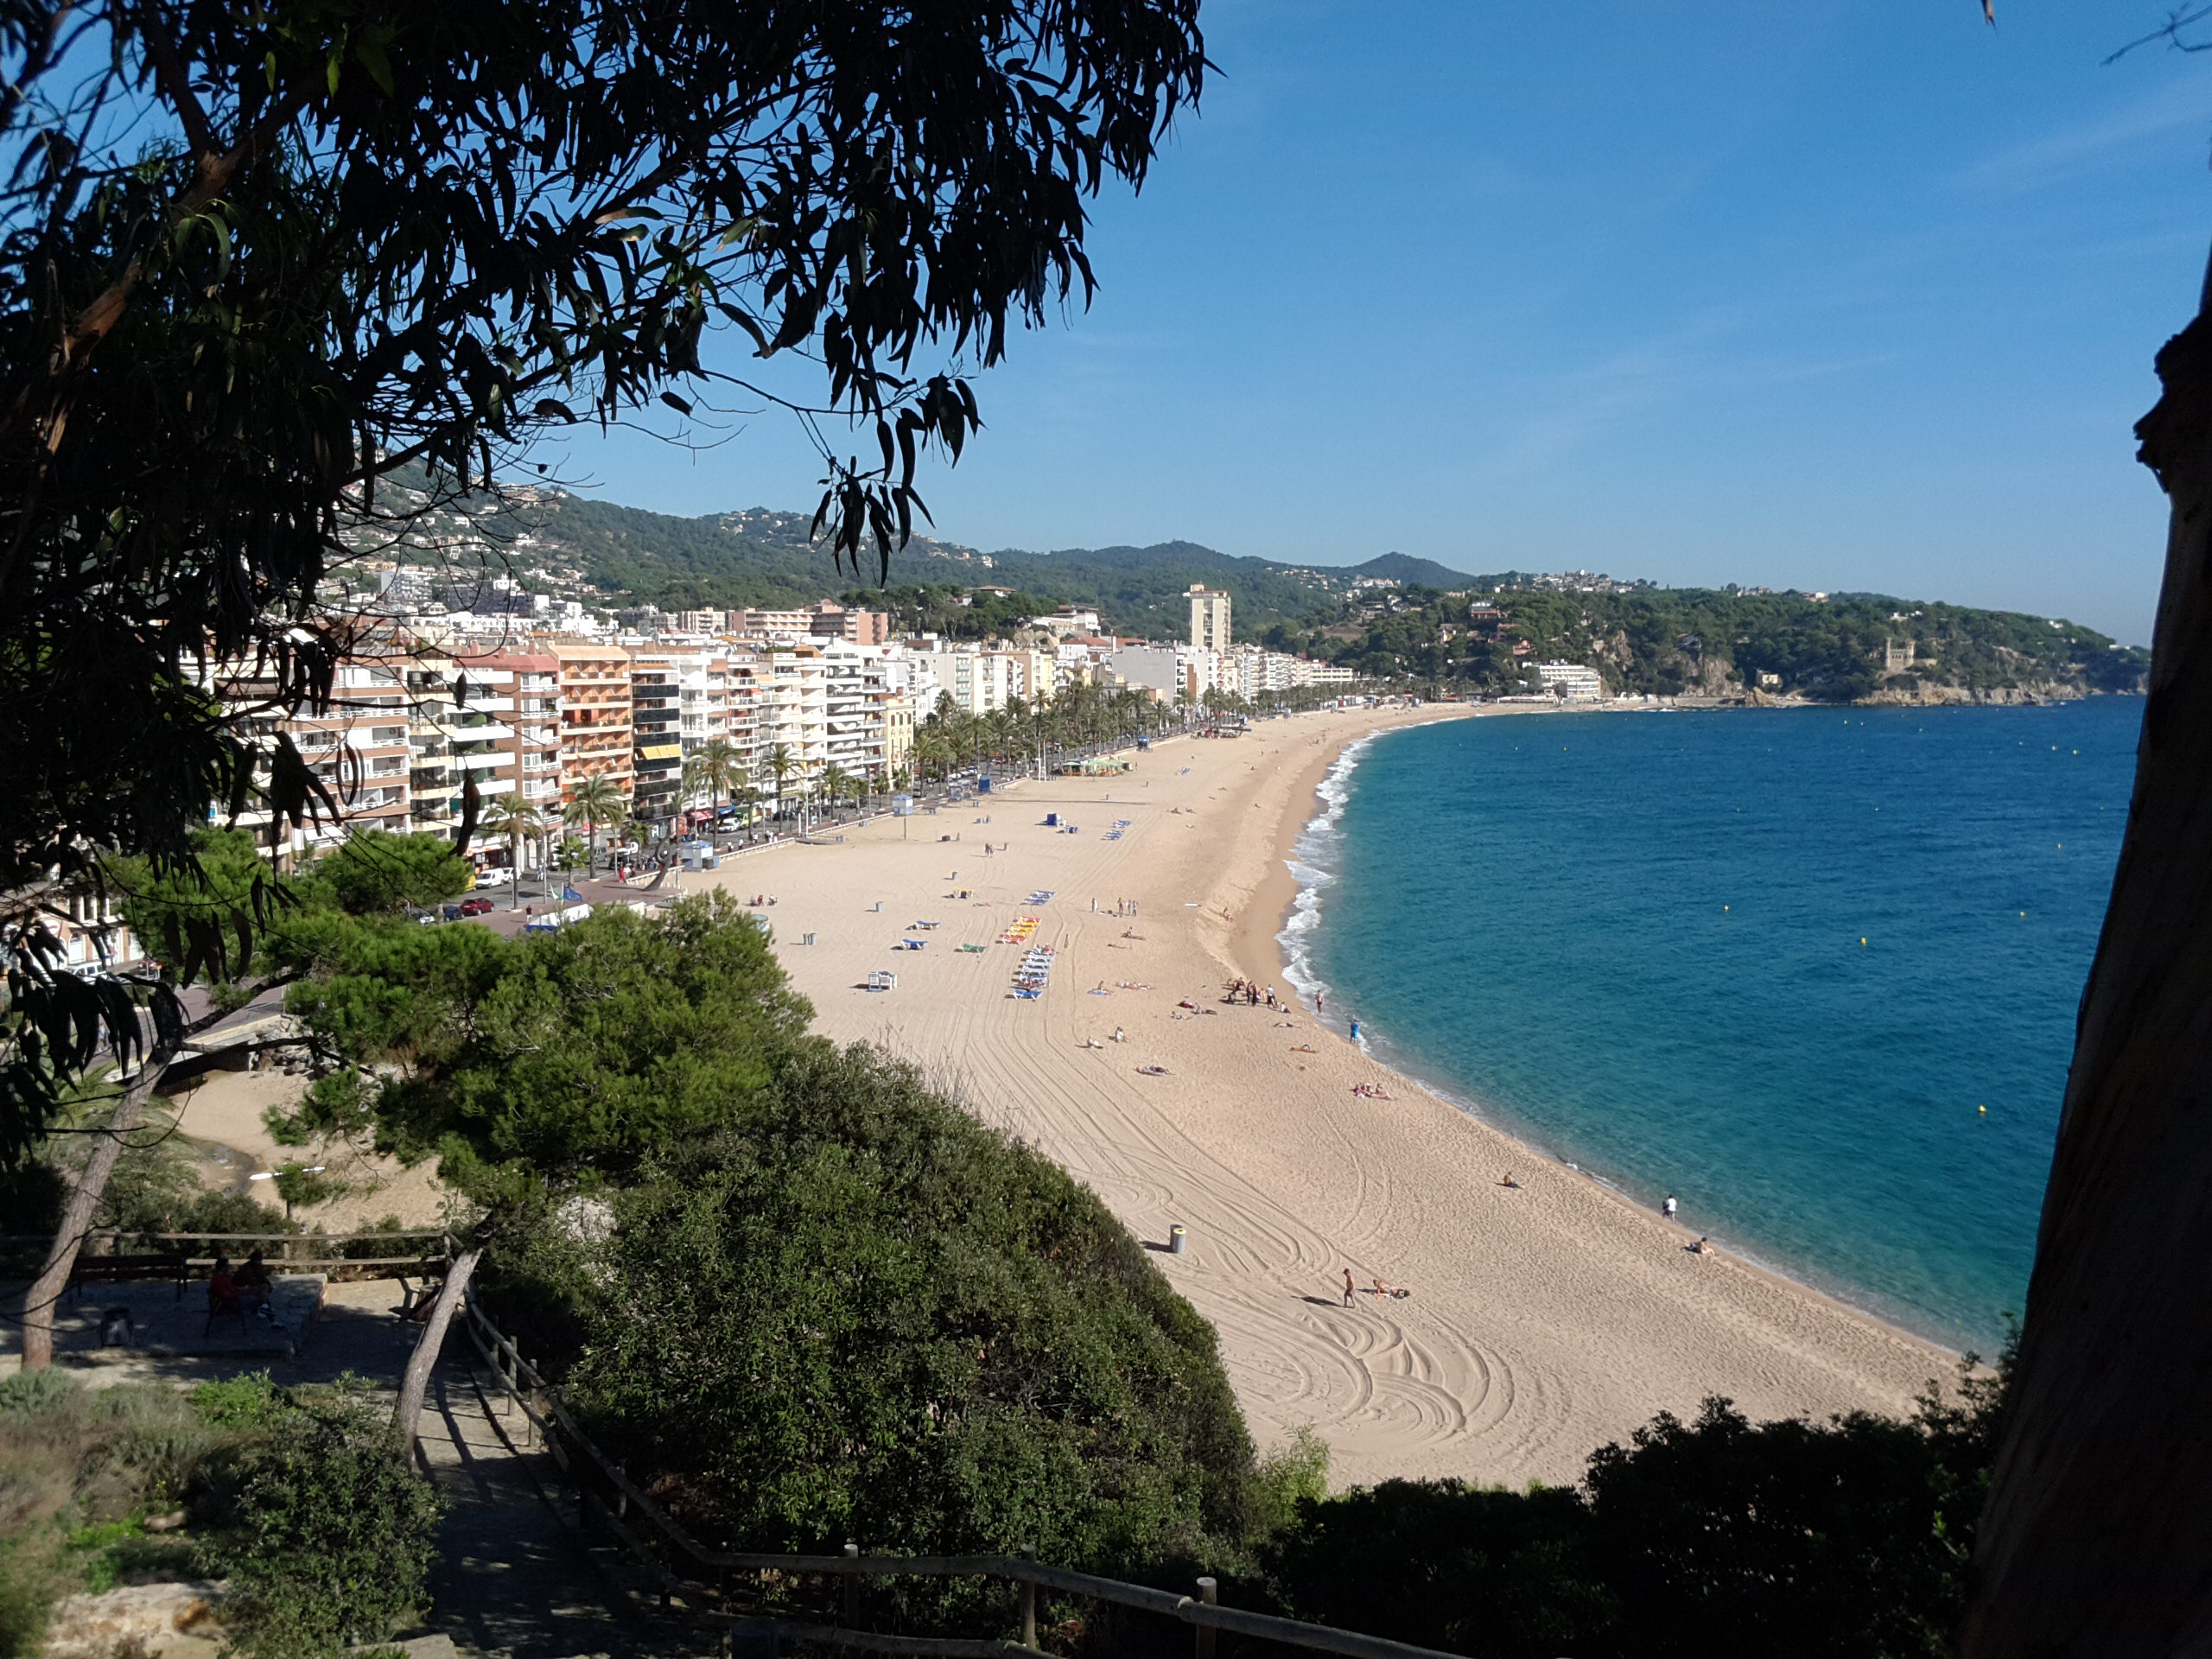 view to the beach of Lloret de Mar